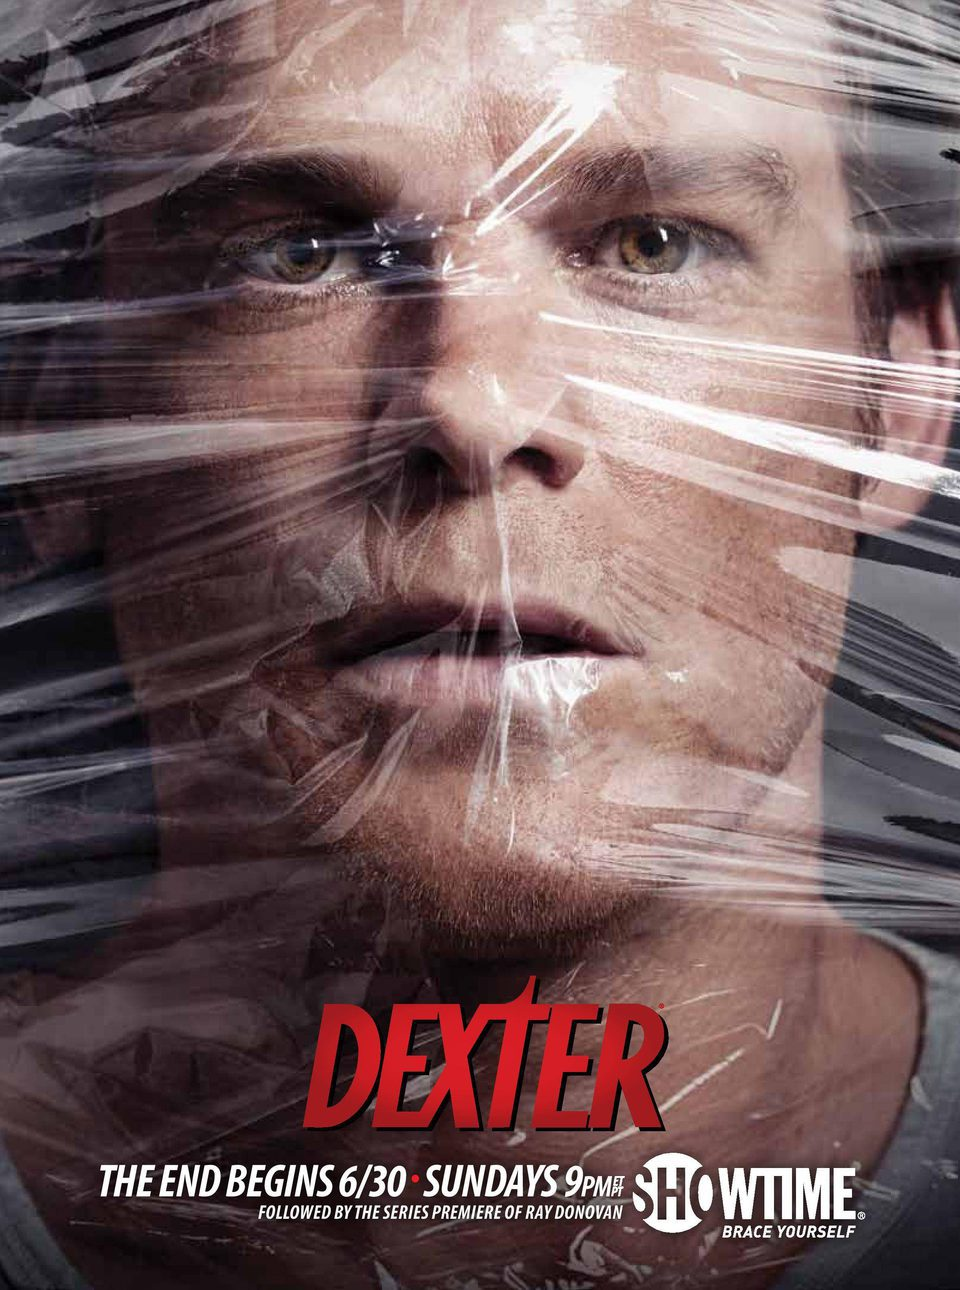 Temporada 8 poster for Dexter